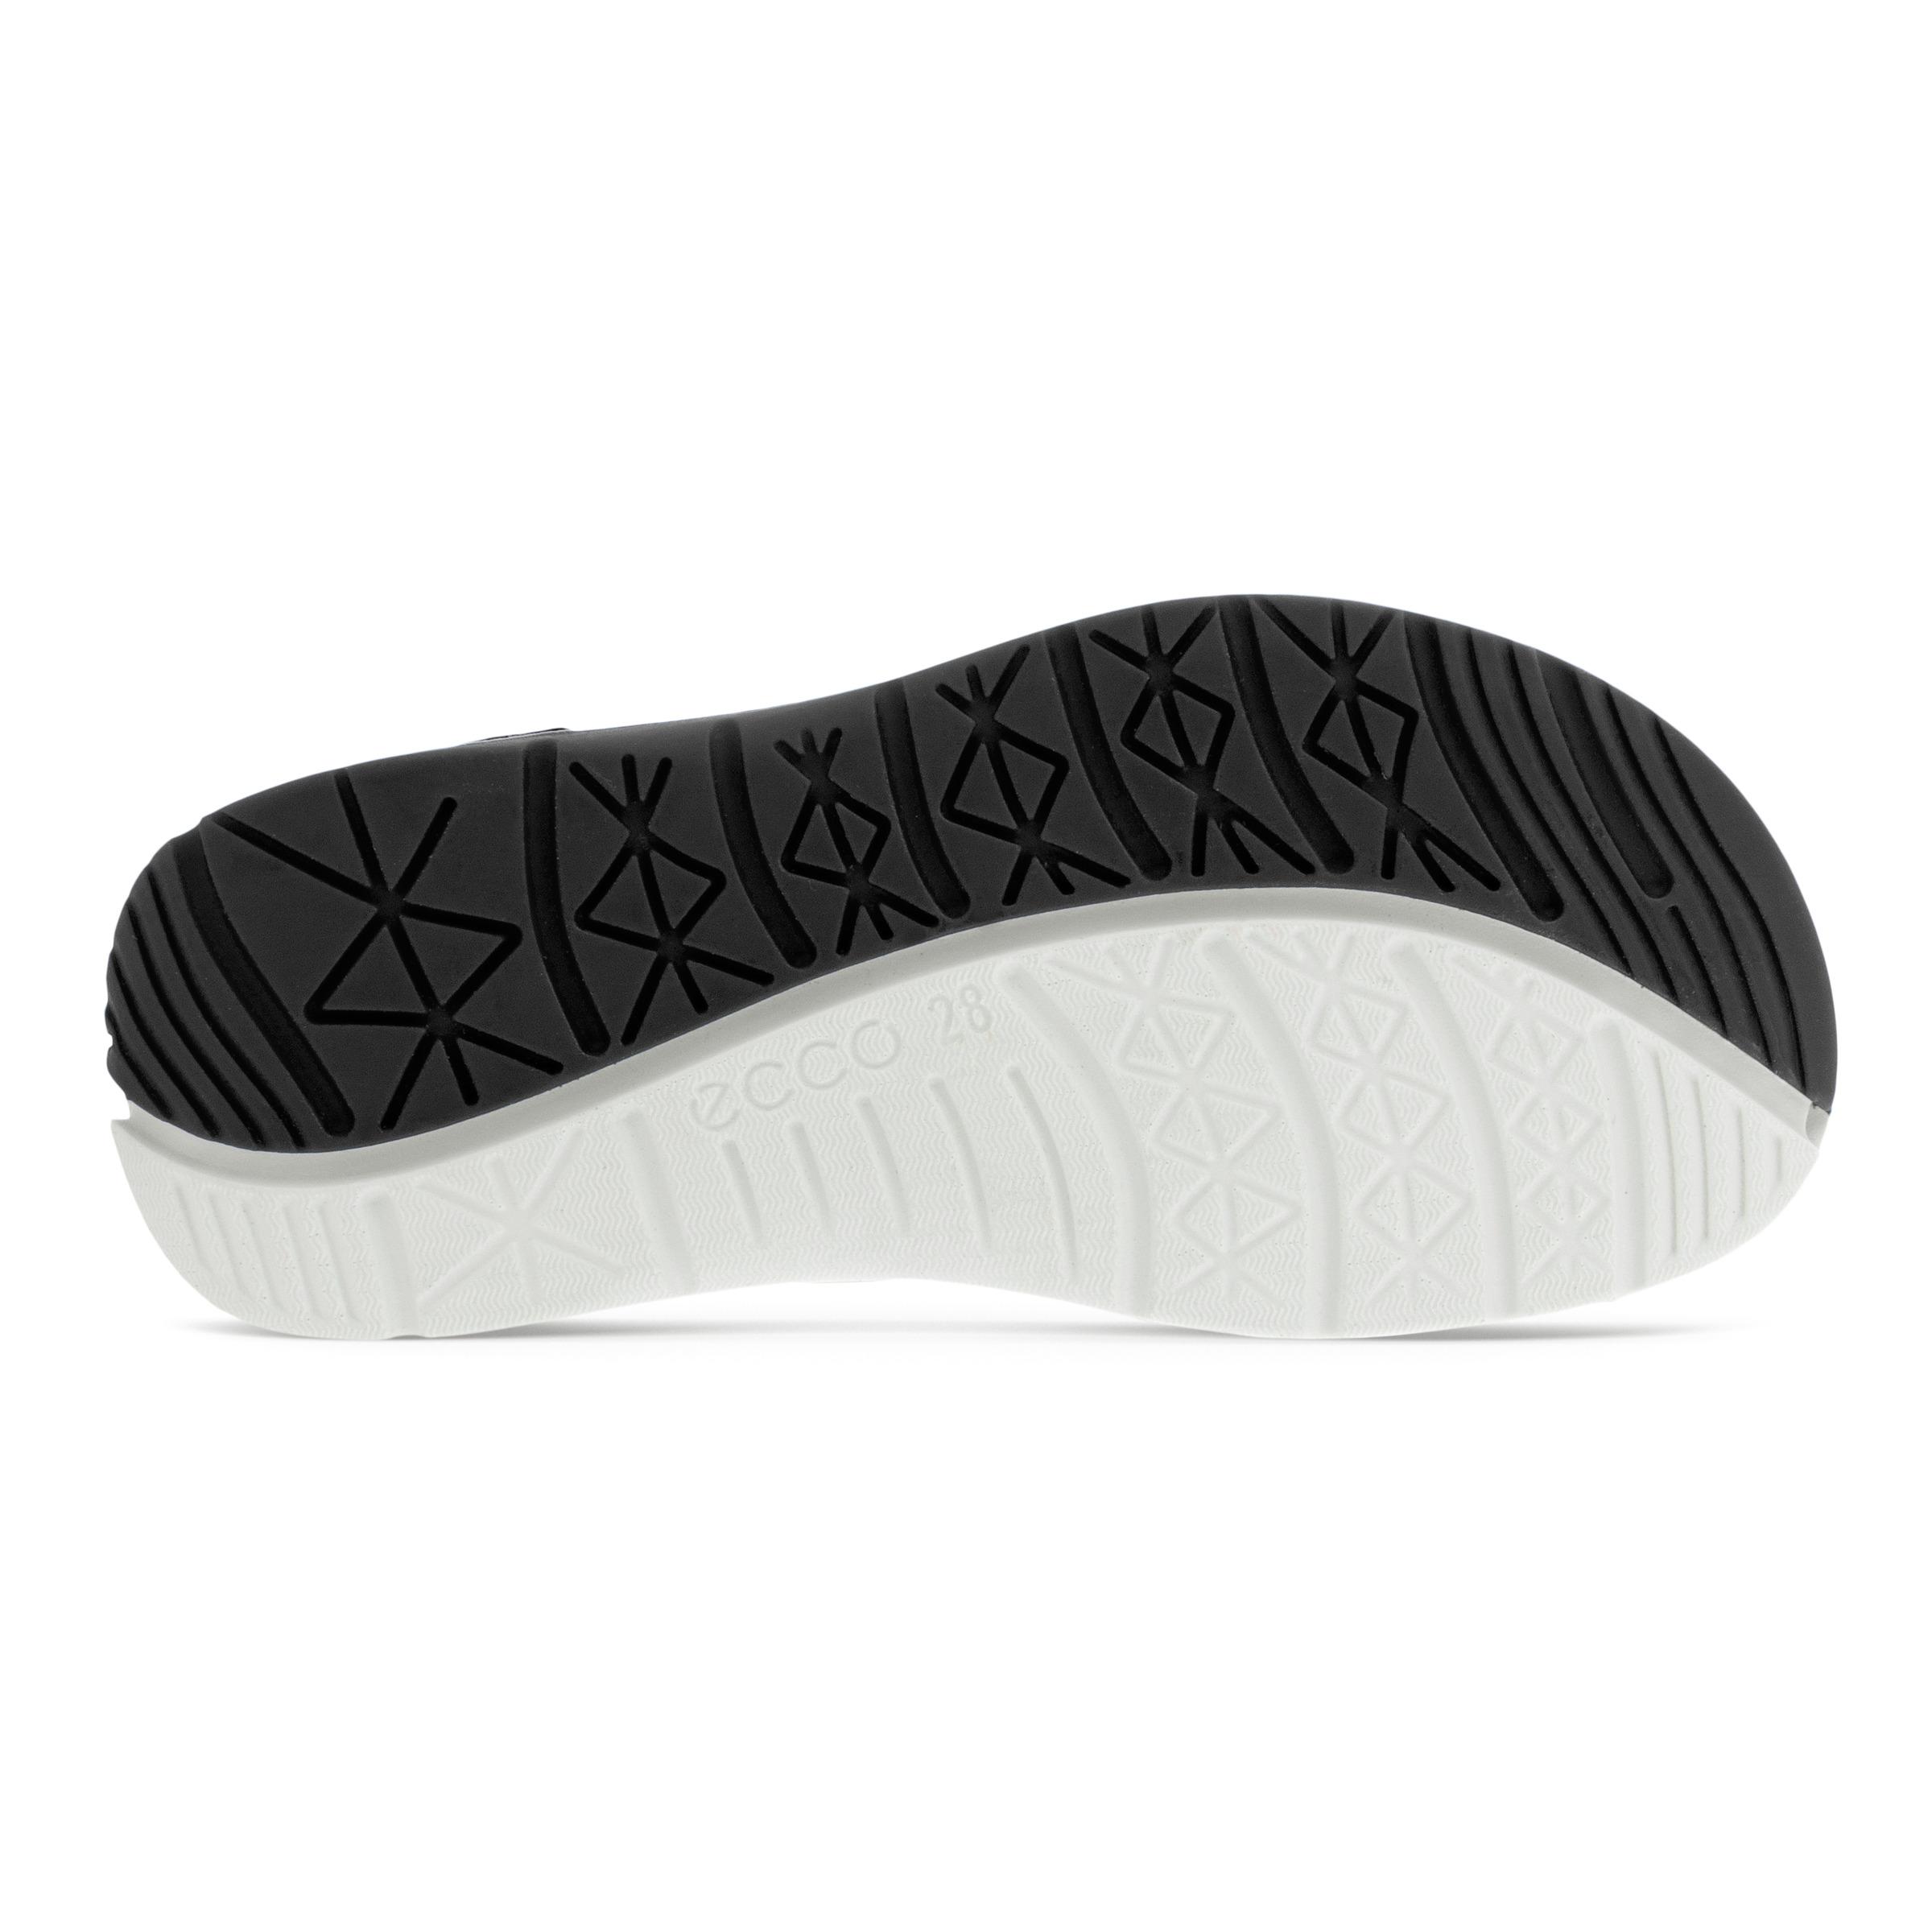 Ecco X-Trinsic sandal, black, 32